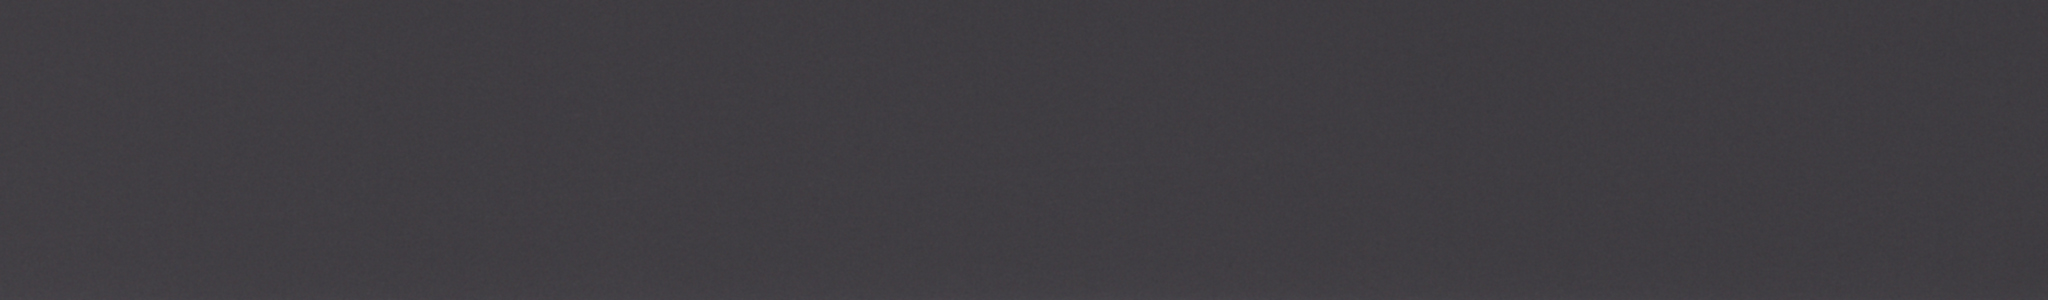 HU 193190 ABS Edge Black Smooth Matt